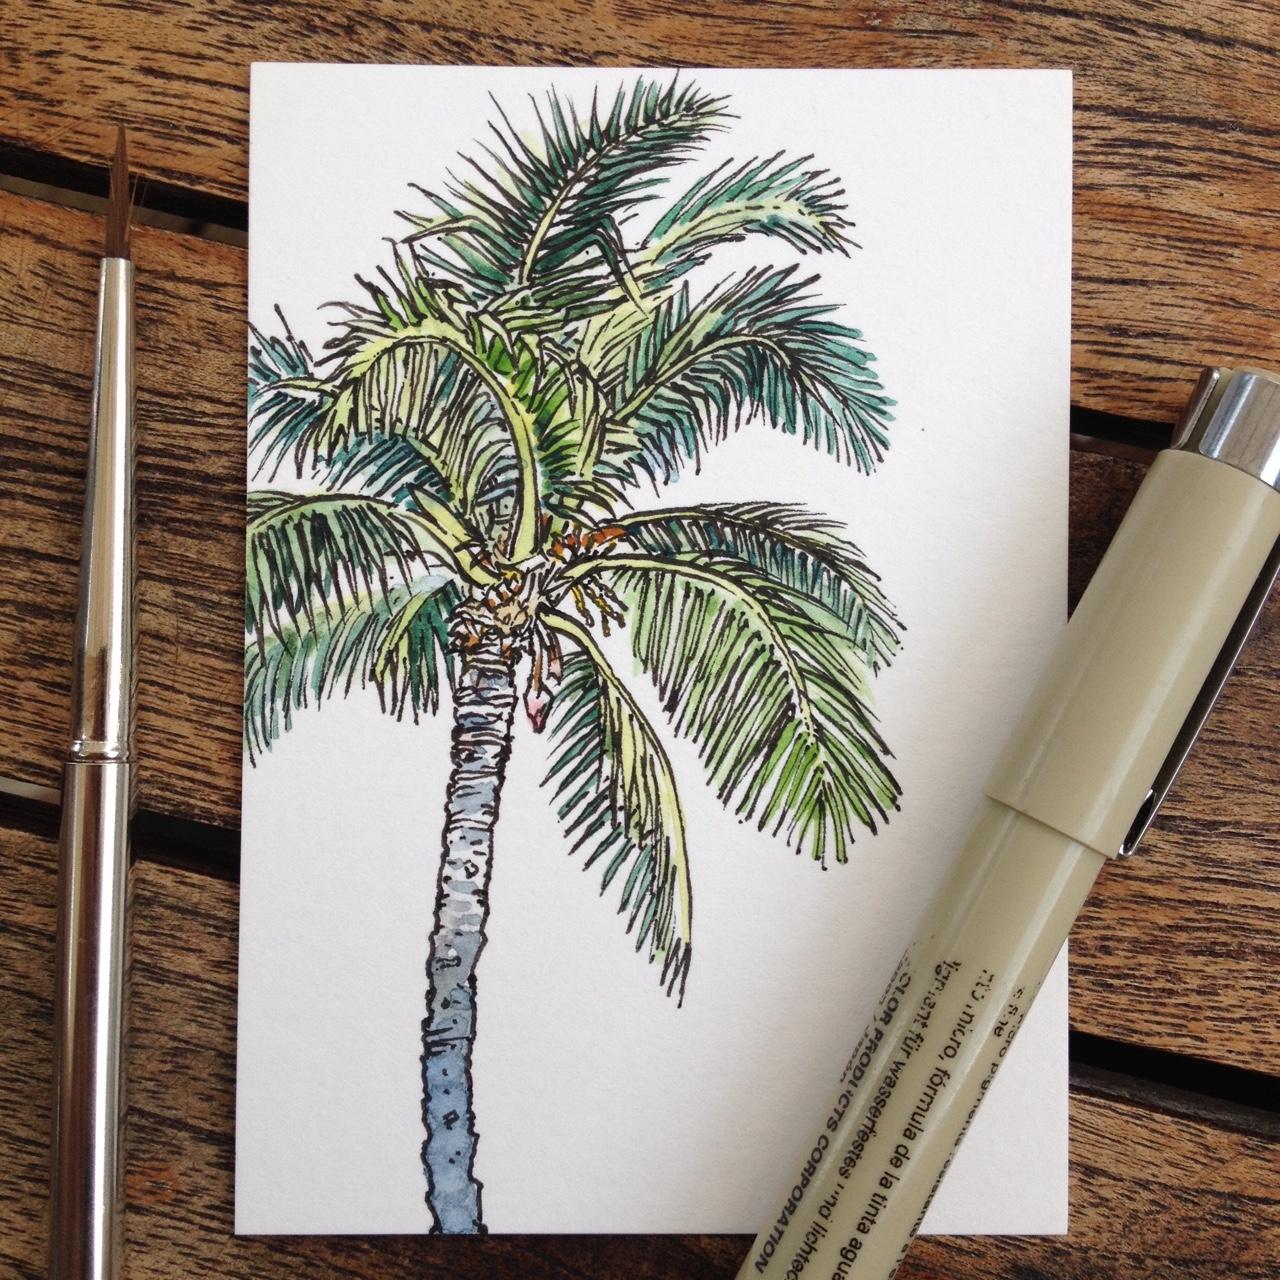 1280x1280 That's A Good Palm Tree.